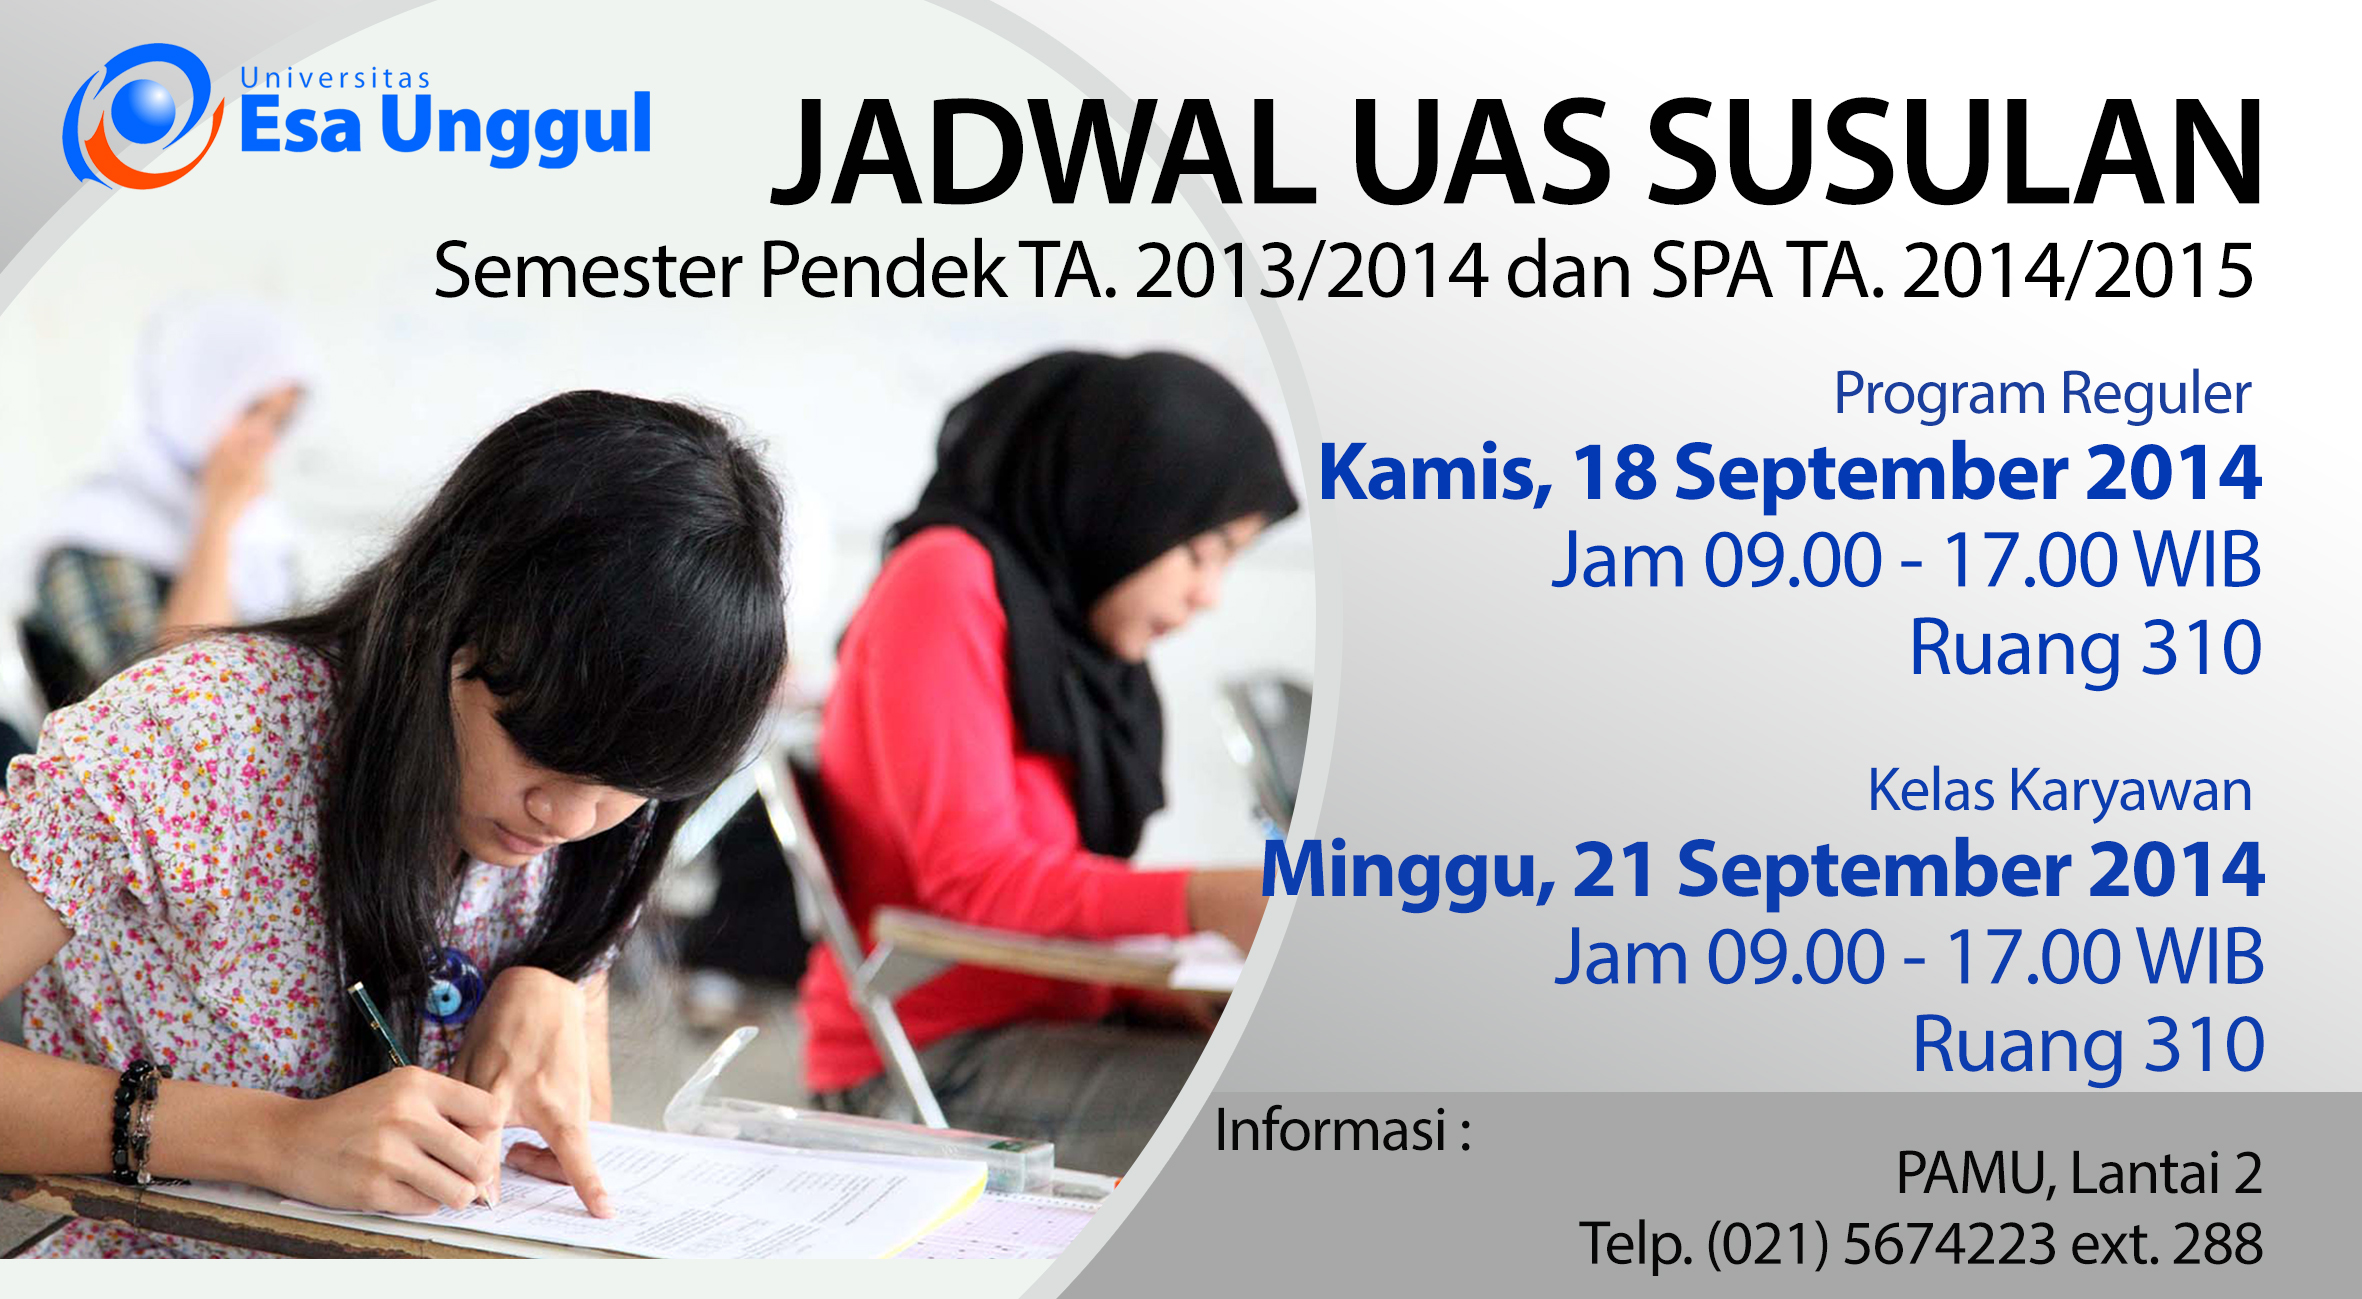 Jadwal dan Tata Cara Ujian Akhir Semester (UAS) Susulan SP/SPA Sem. 2013/2014